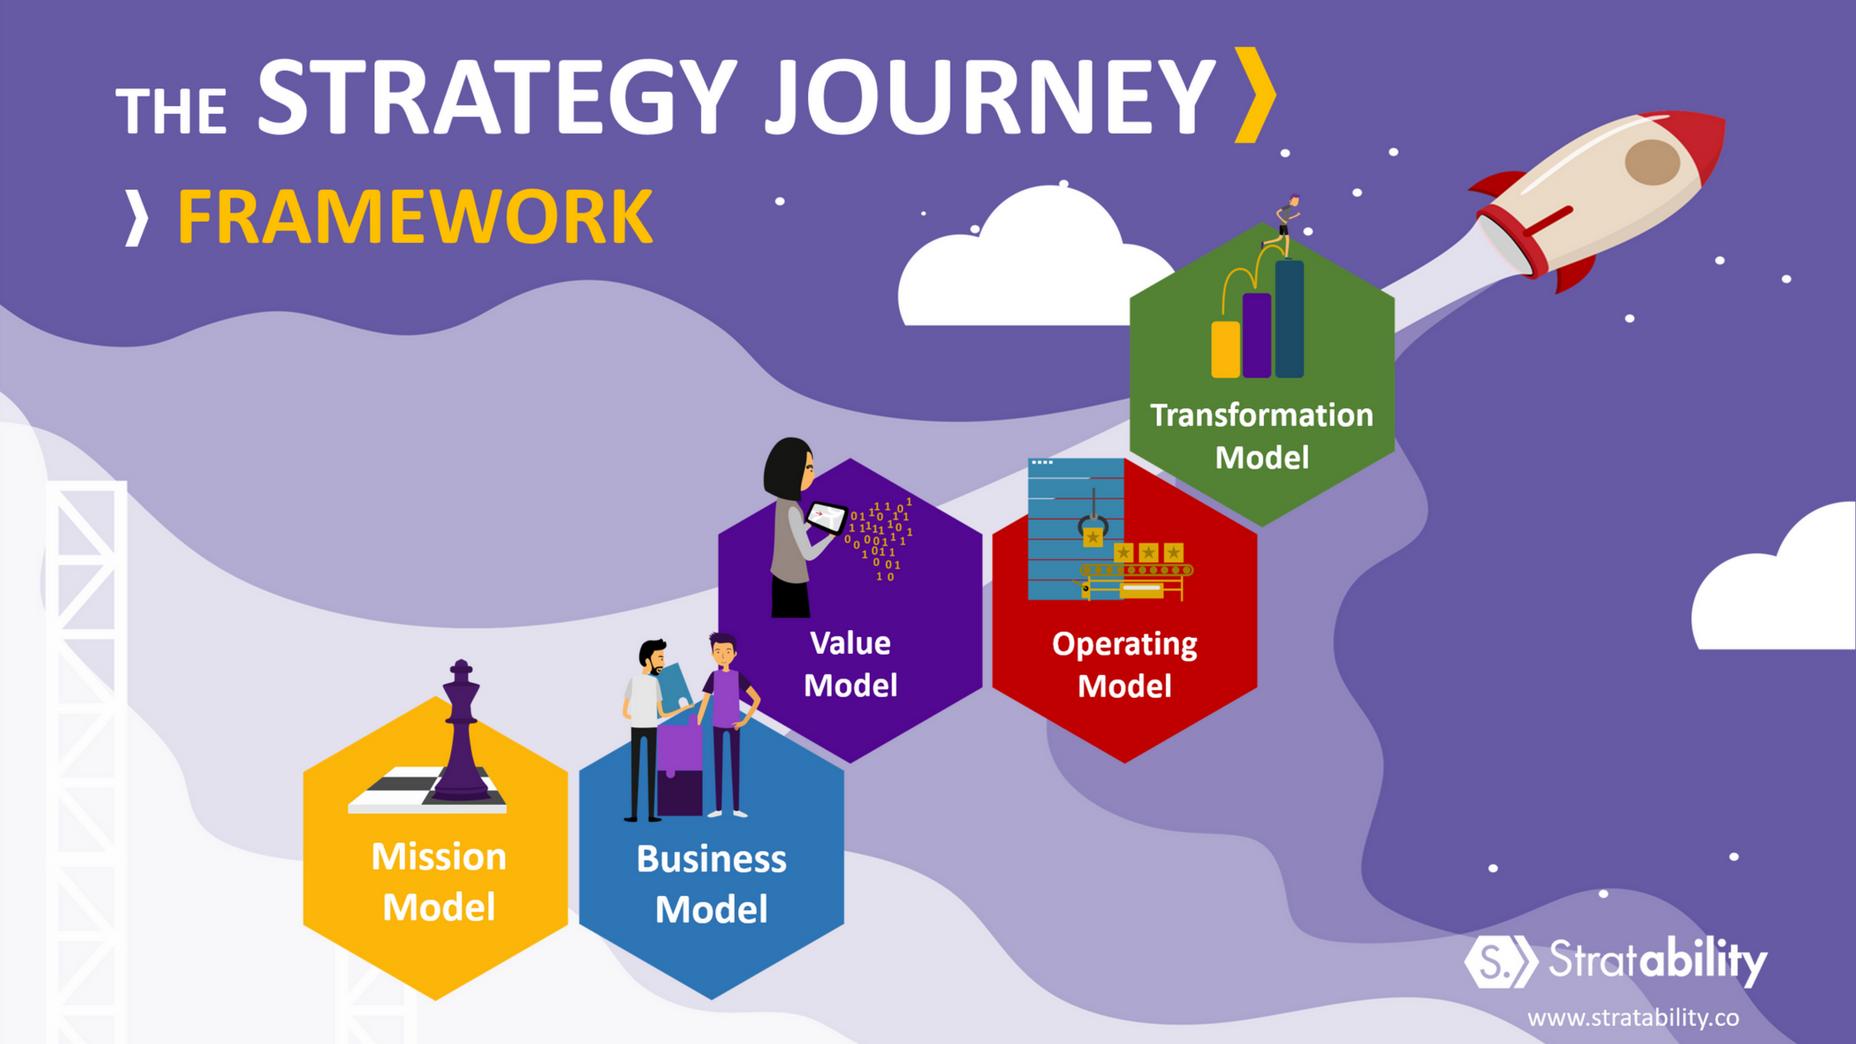 The Strategy Journey Framework